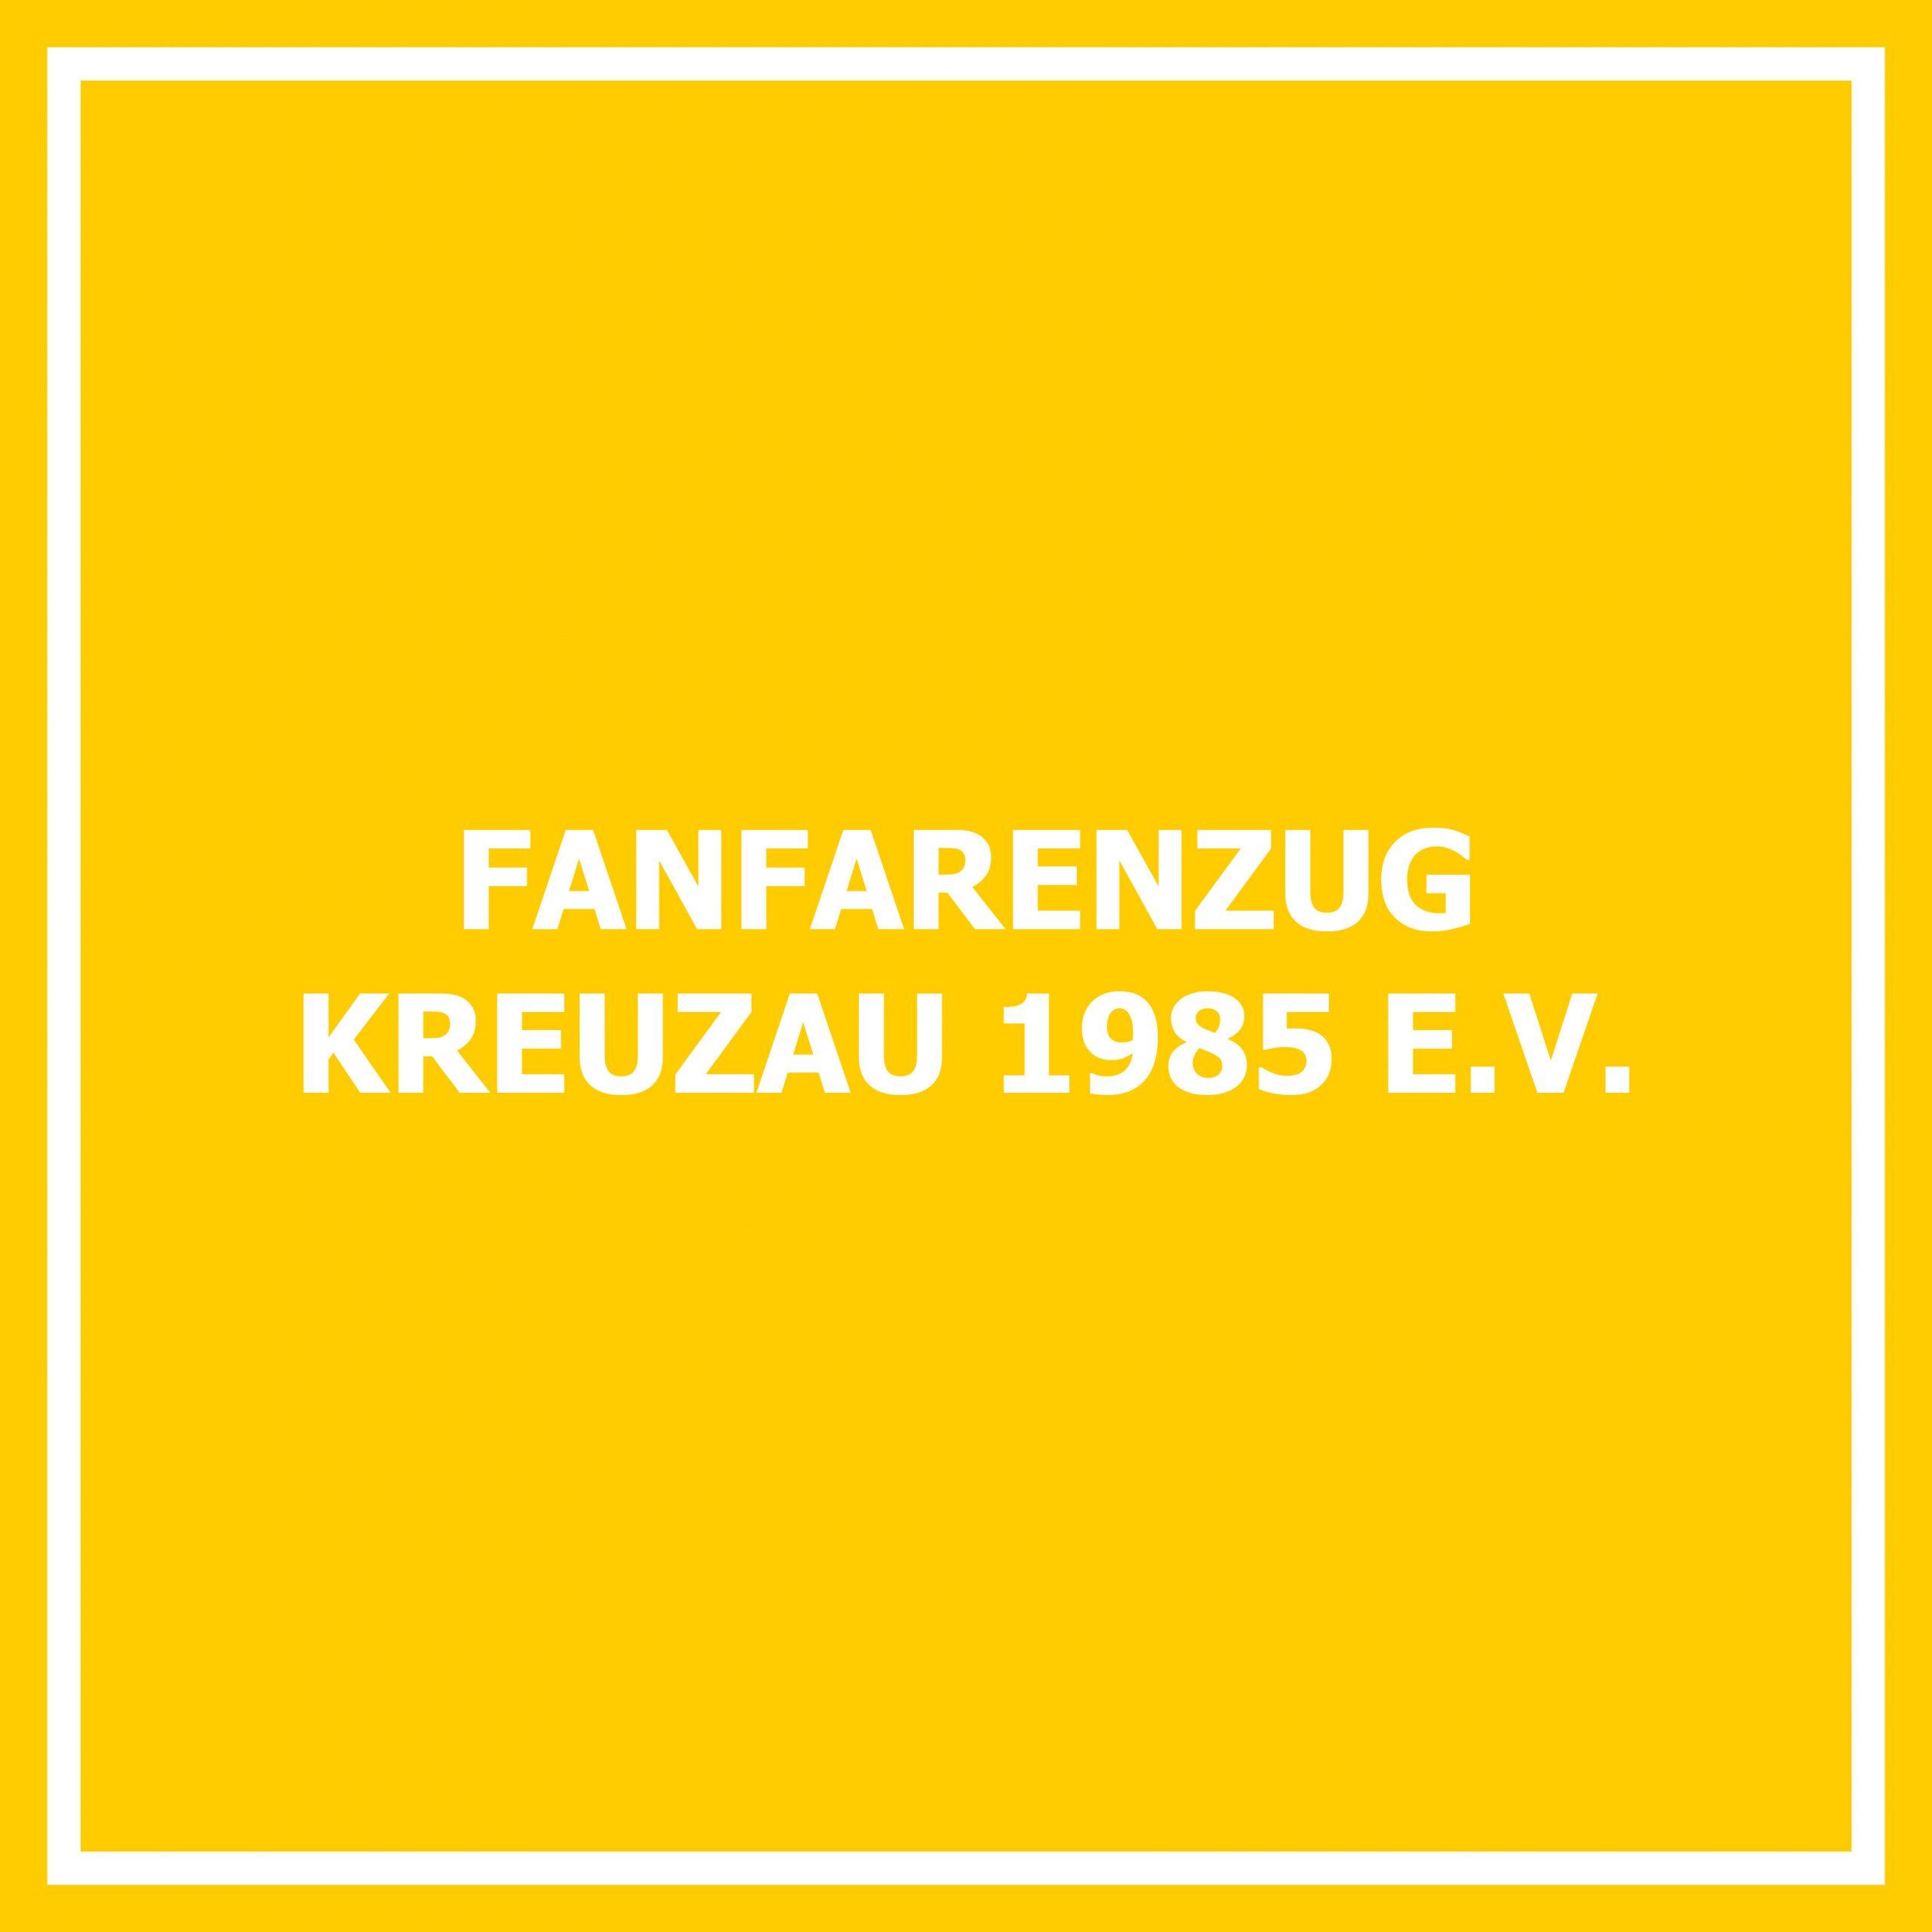 Fanfarenzug Kreuzau 1985 e. V.